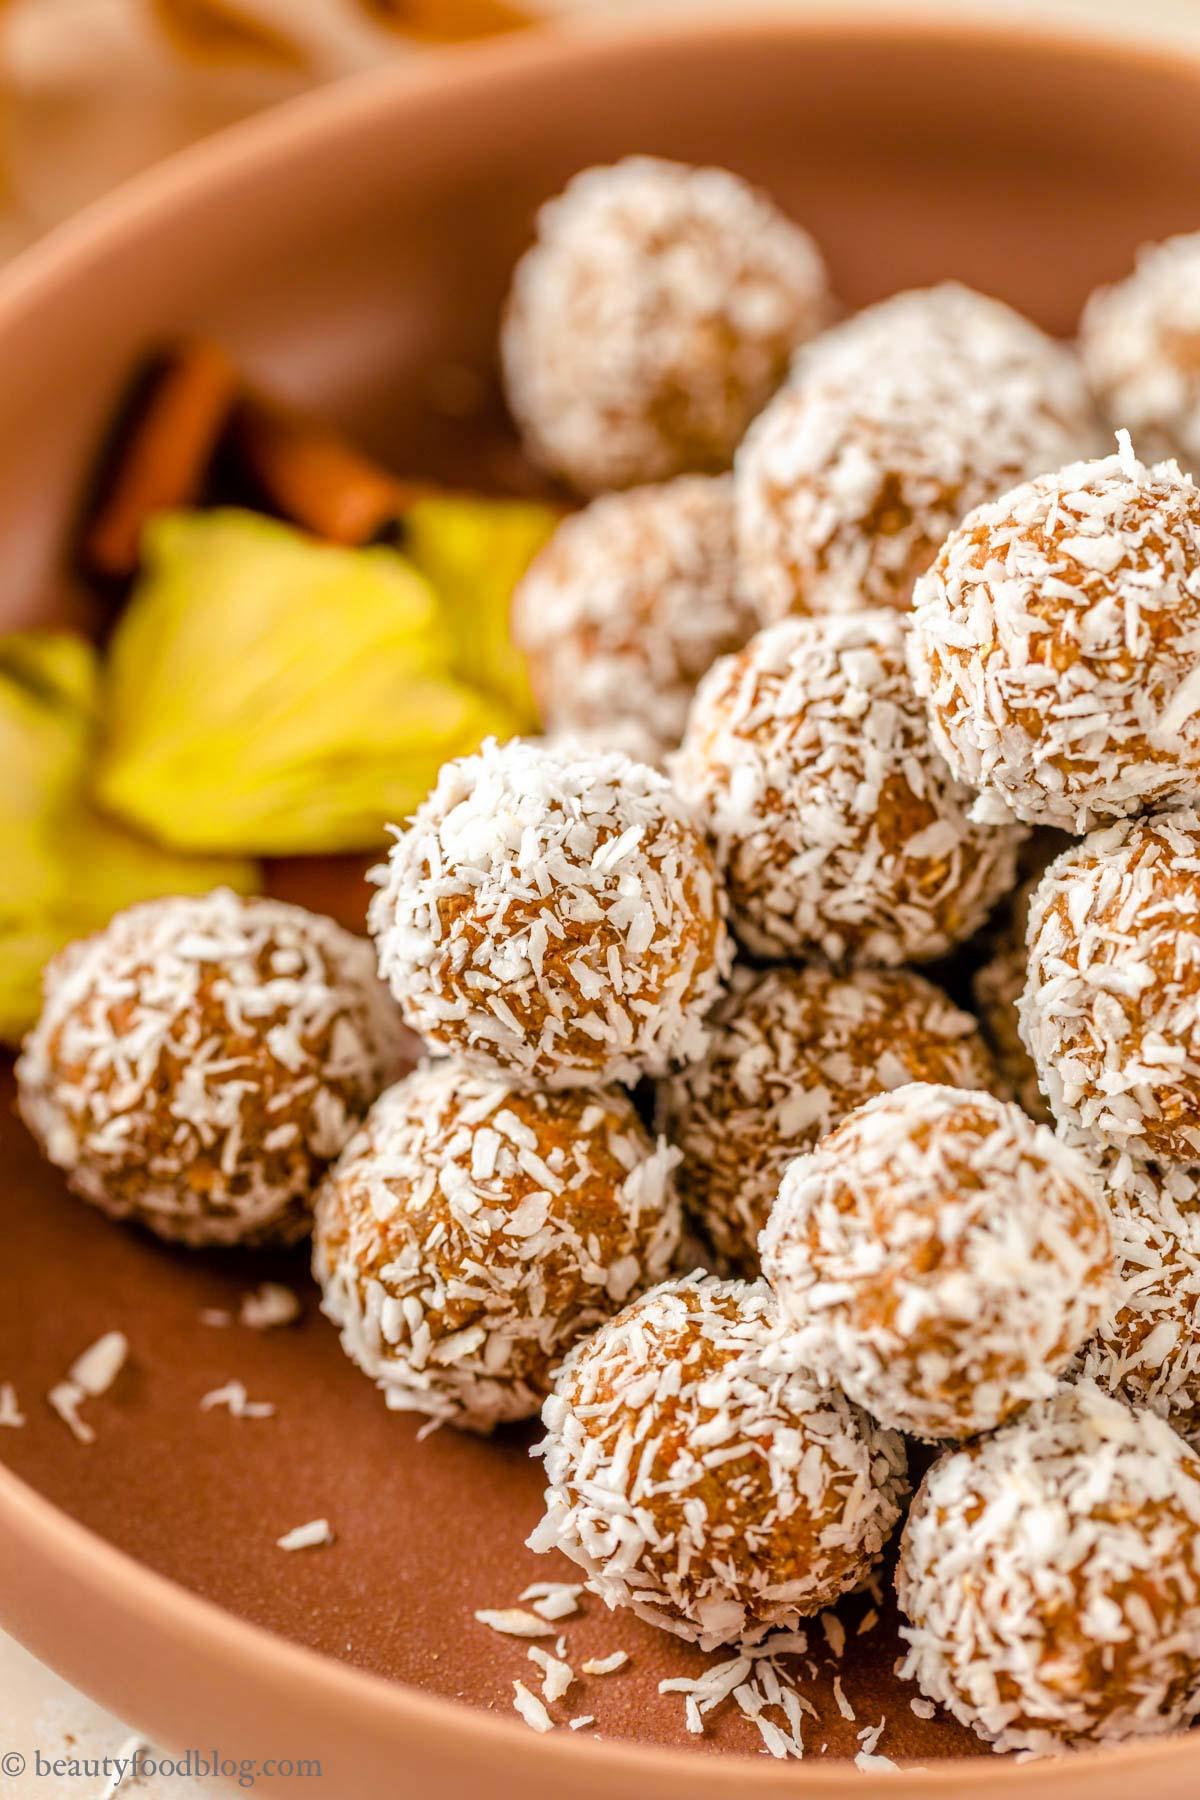 healthy no-bake nut-free vegan carrot cake bites with coconut recipe ricetta energy balls alle carote senza frutta secca senza zuccheri aggiunti merenda sana